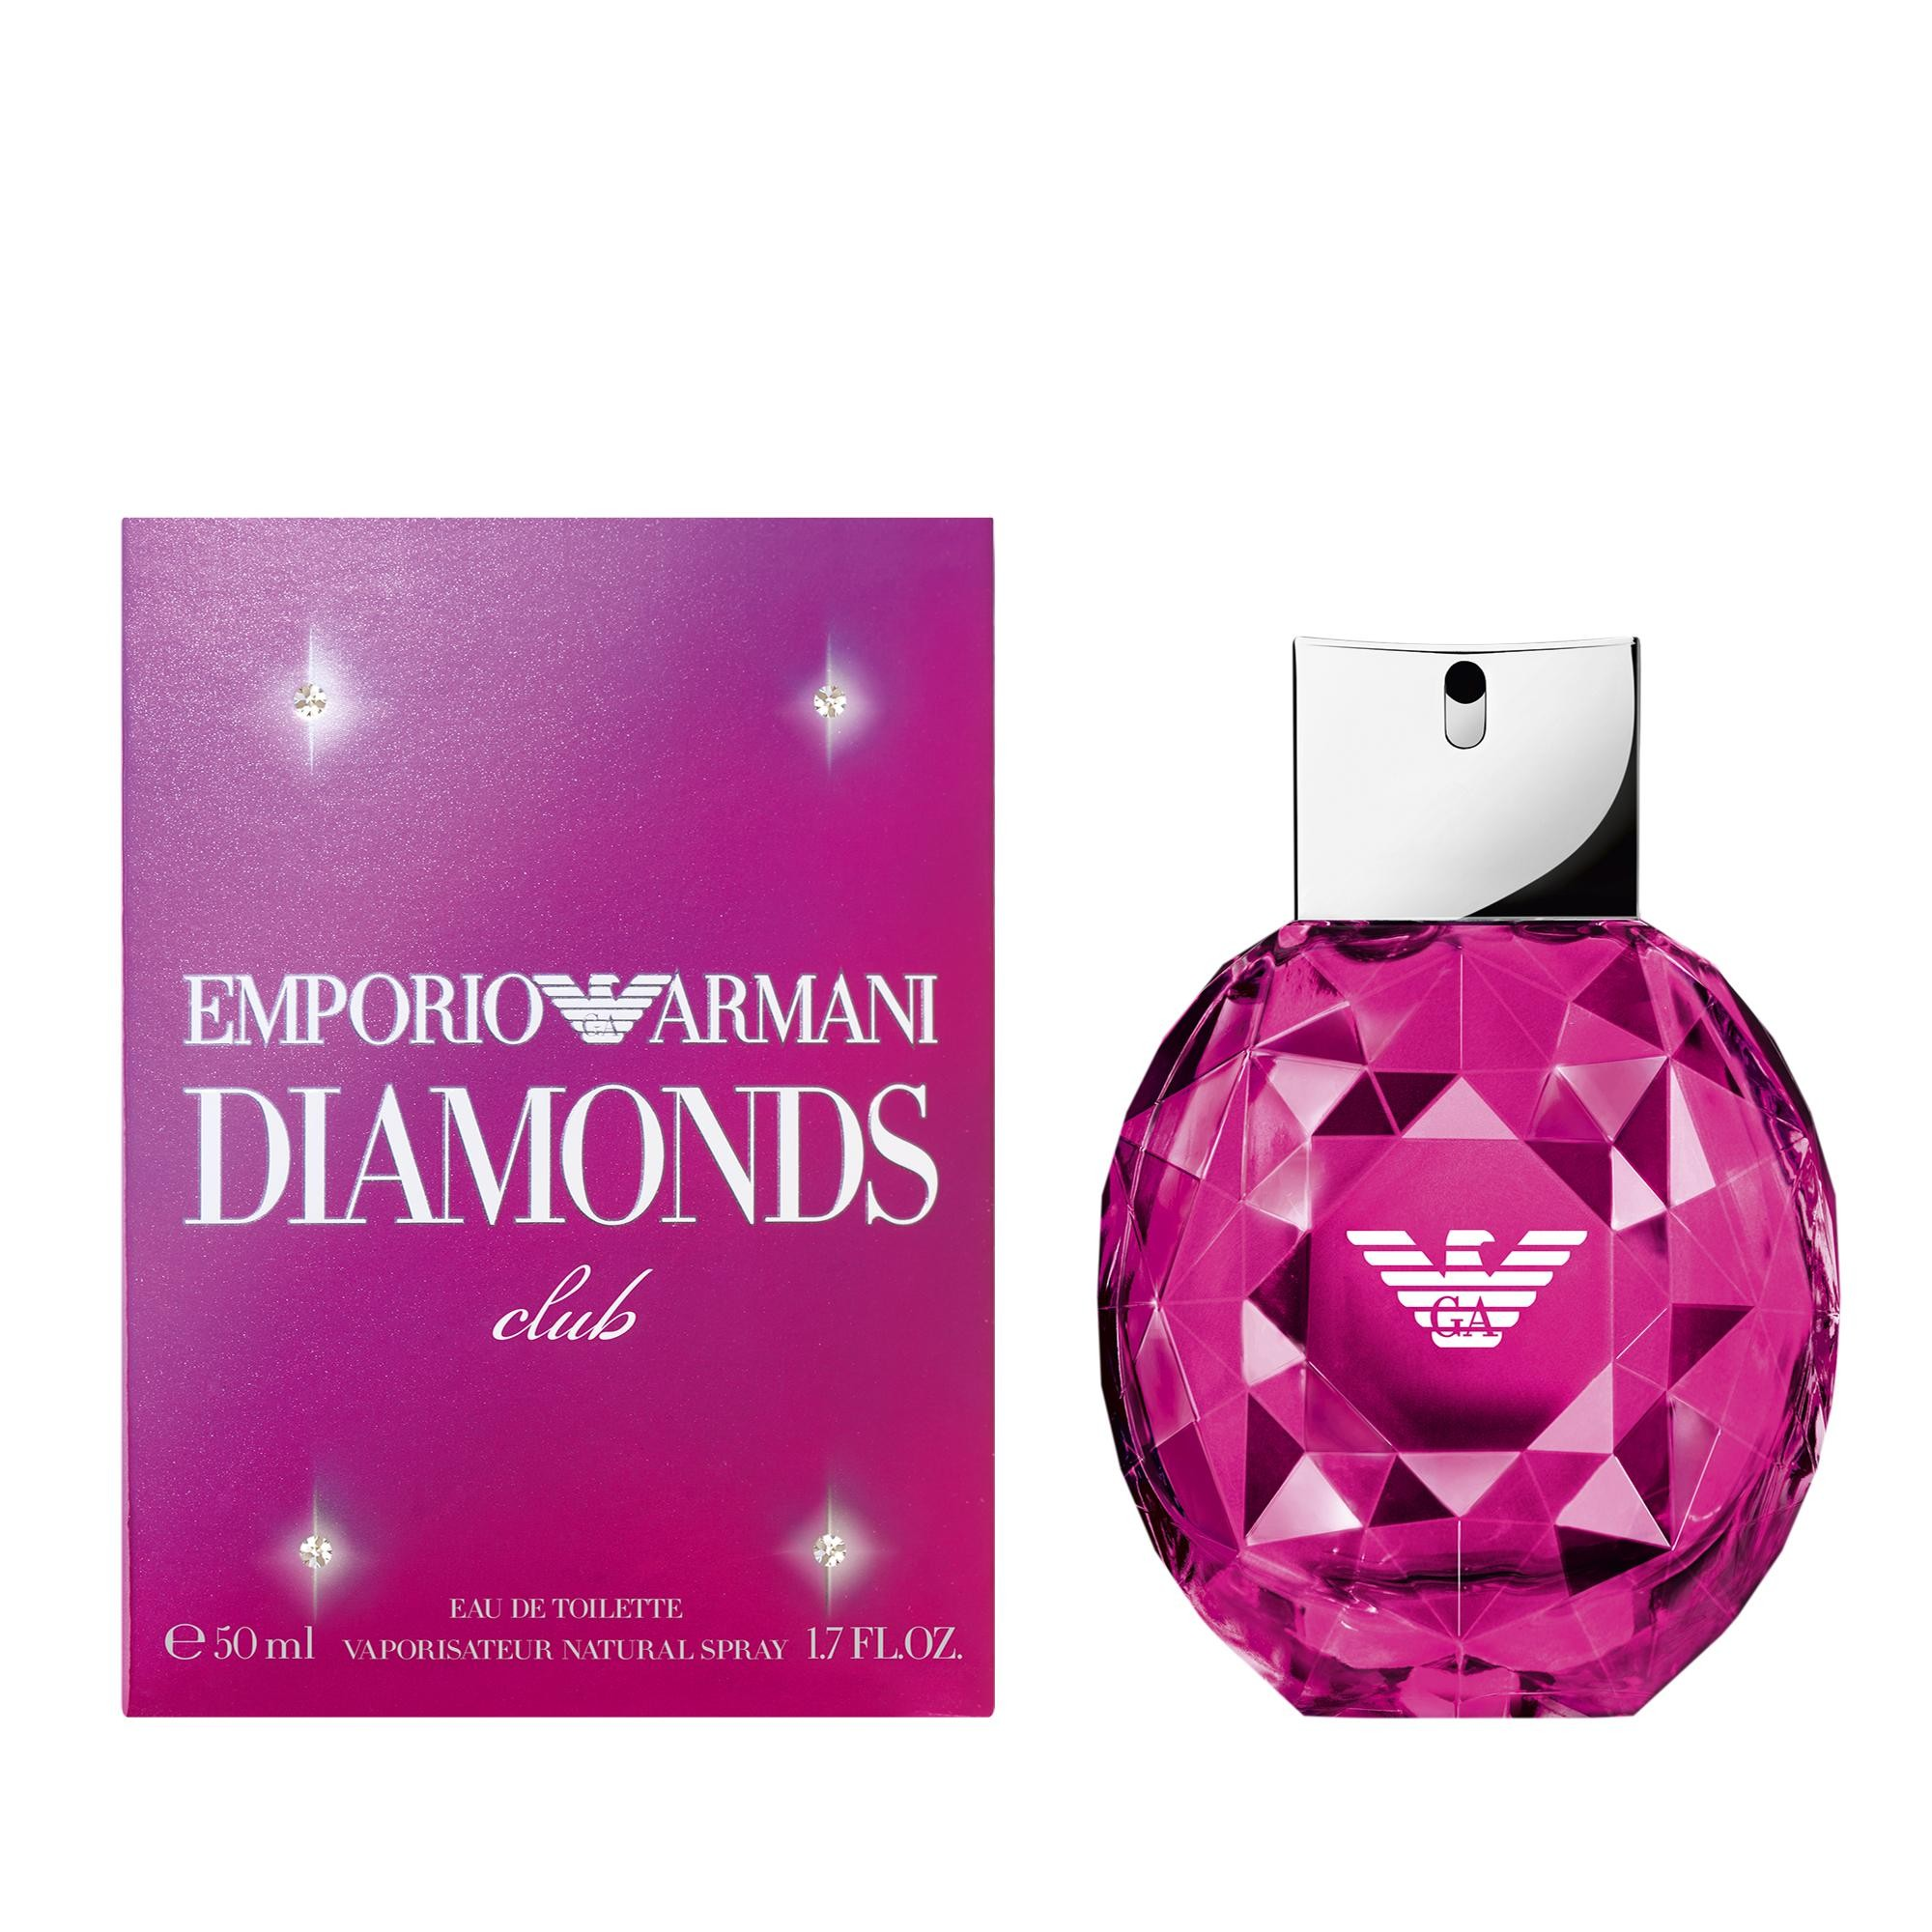 Emporio Armani Diamonds Club аромат для женщин